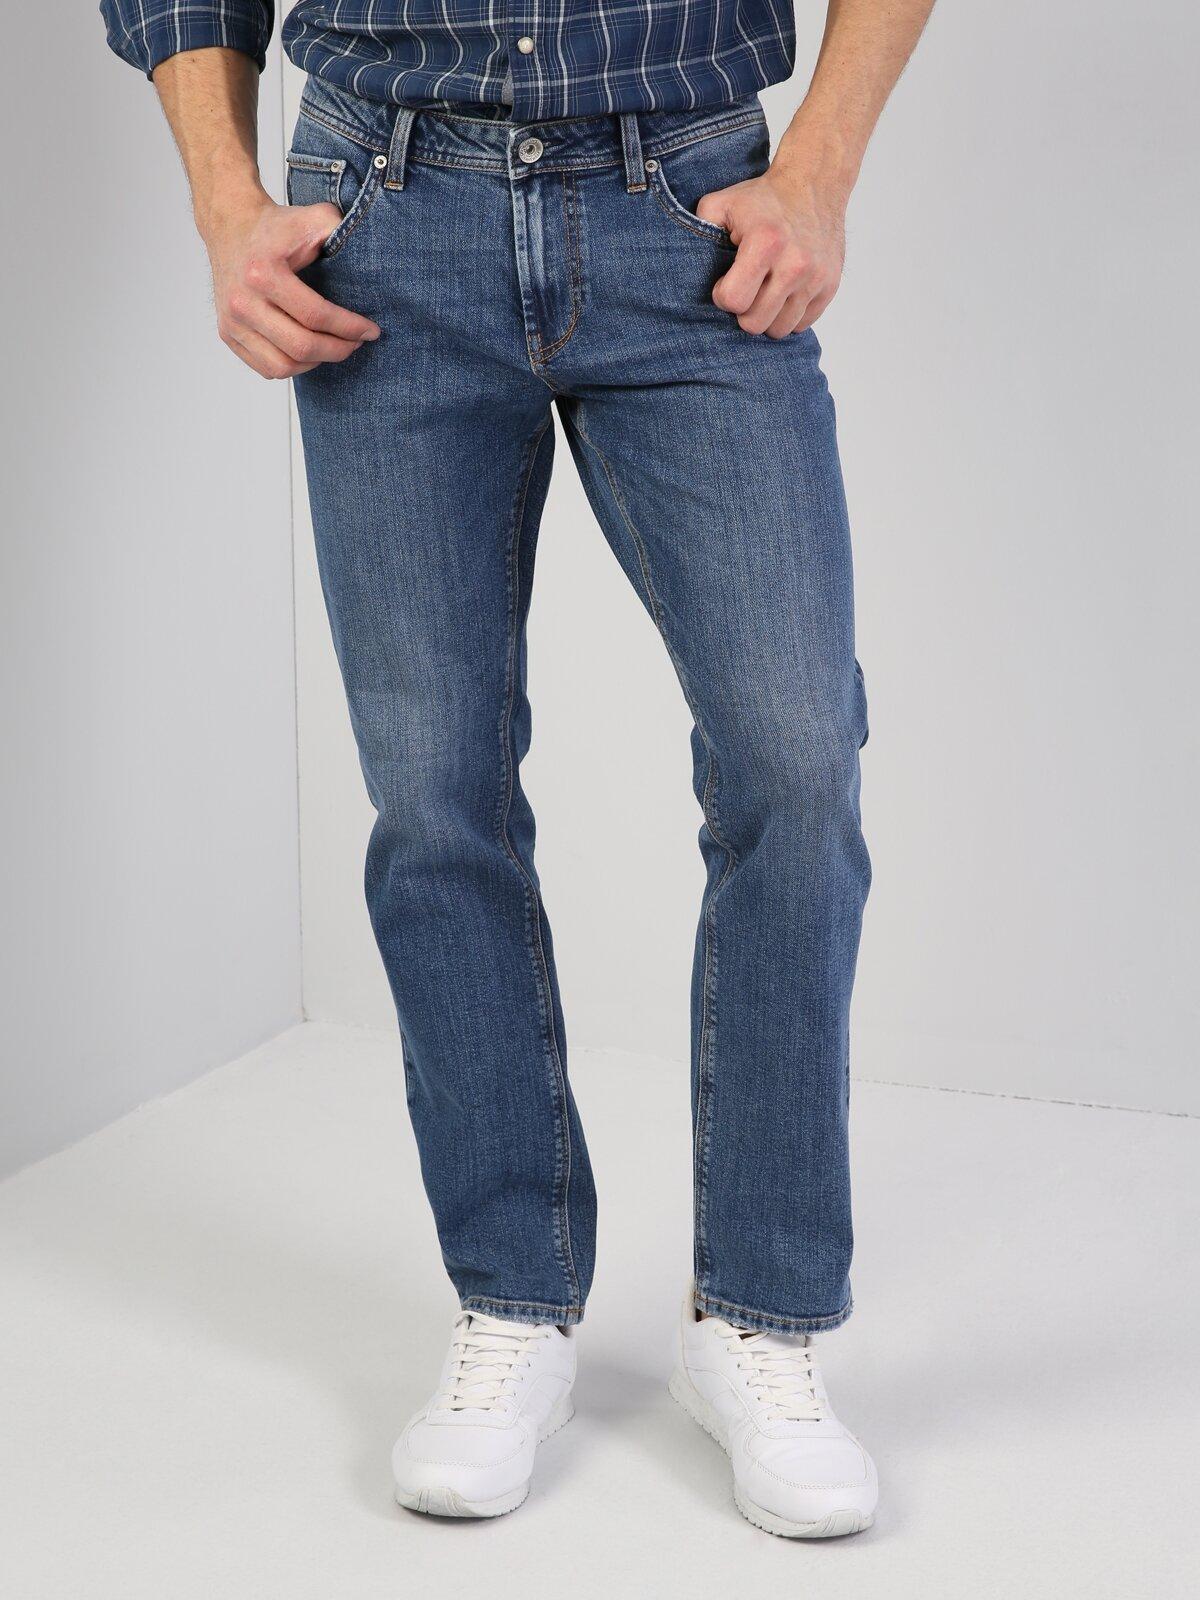 045 David Normal Kesim Orta Bel Geniş Paça Mavi Jean Pantolon